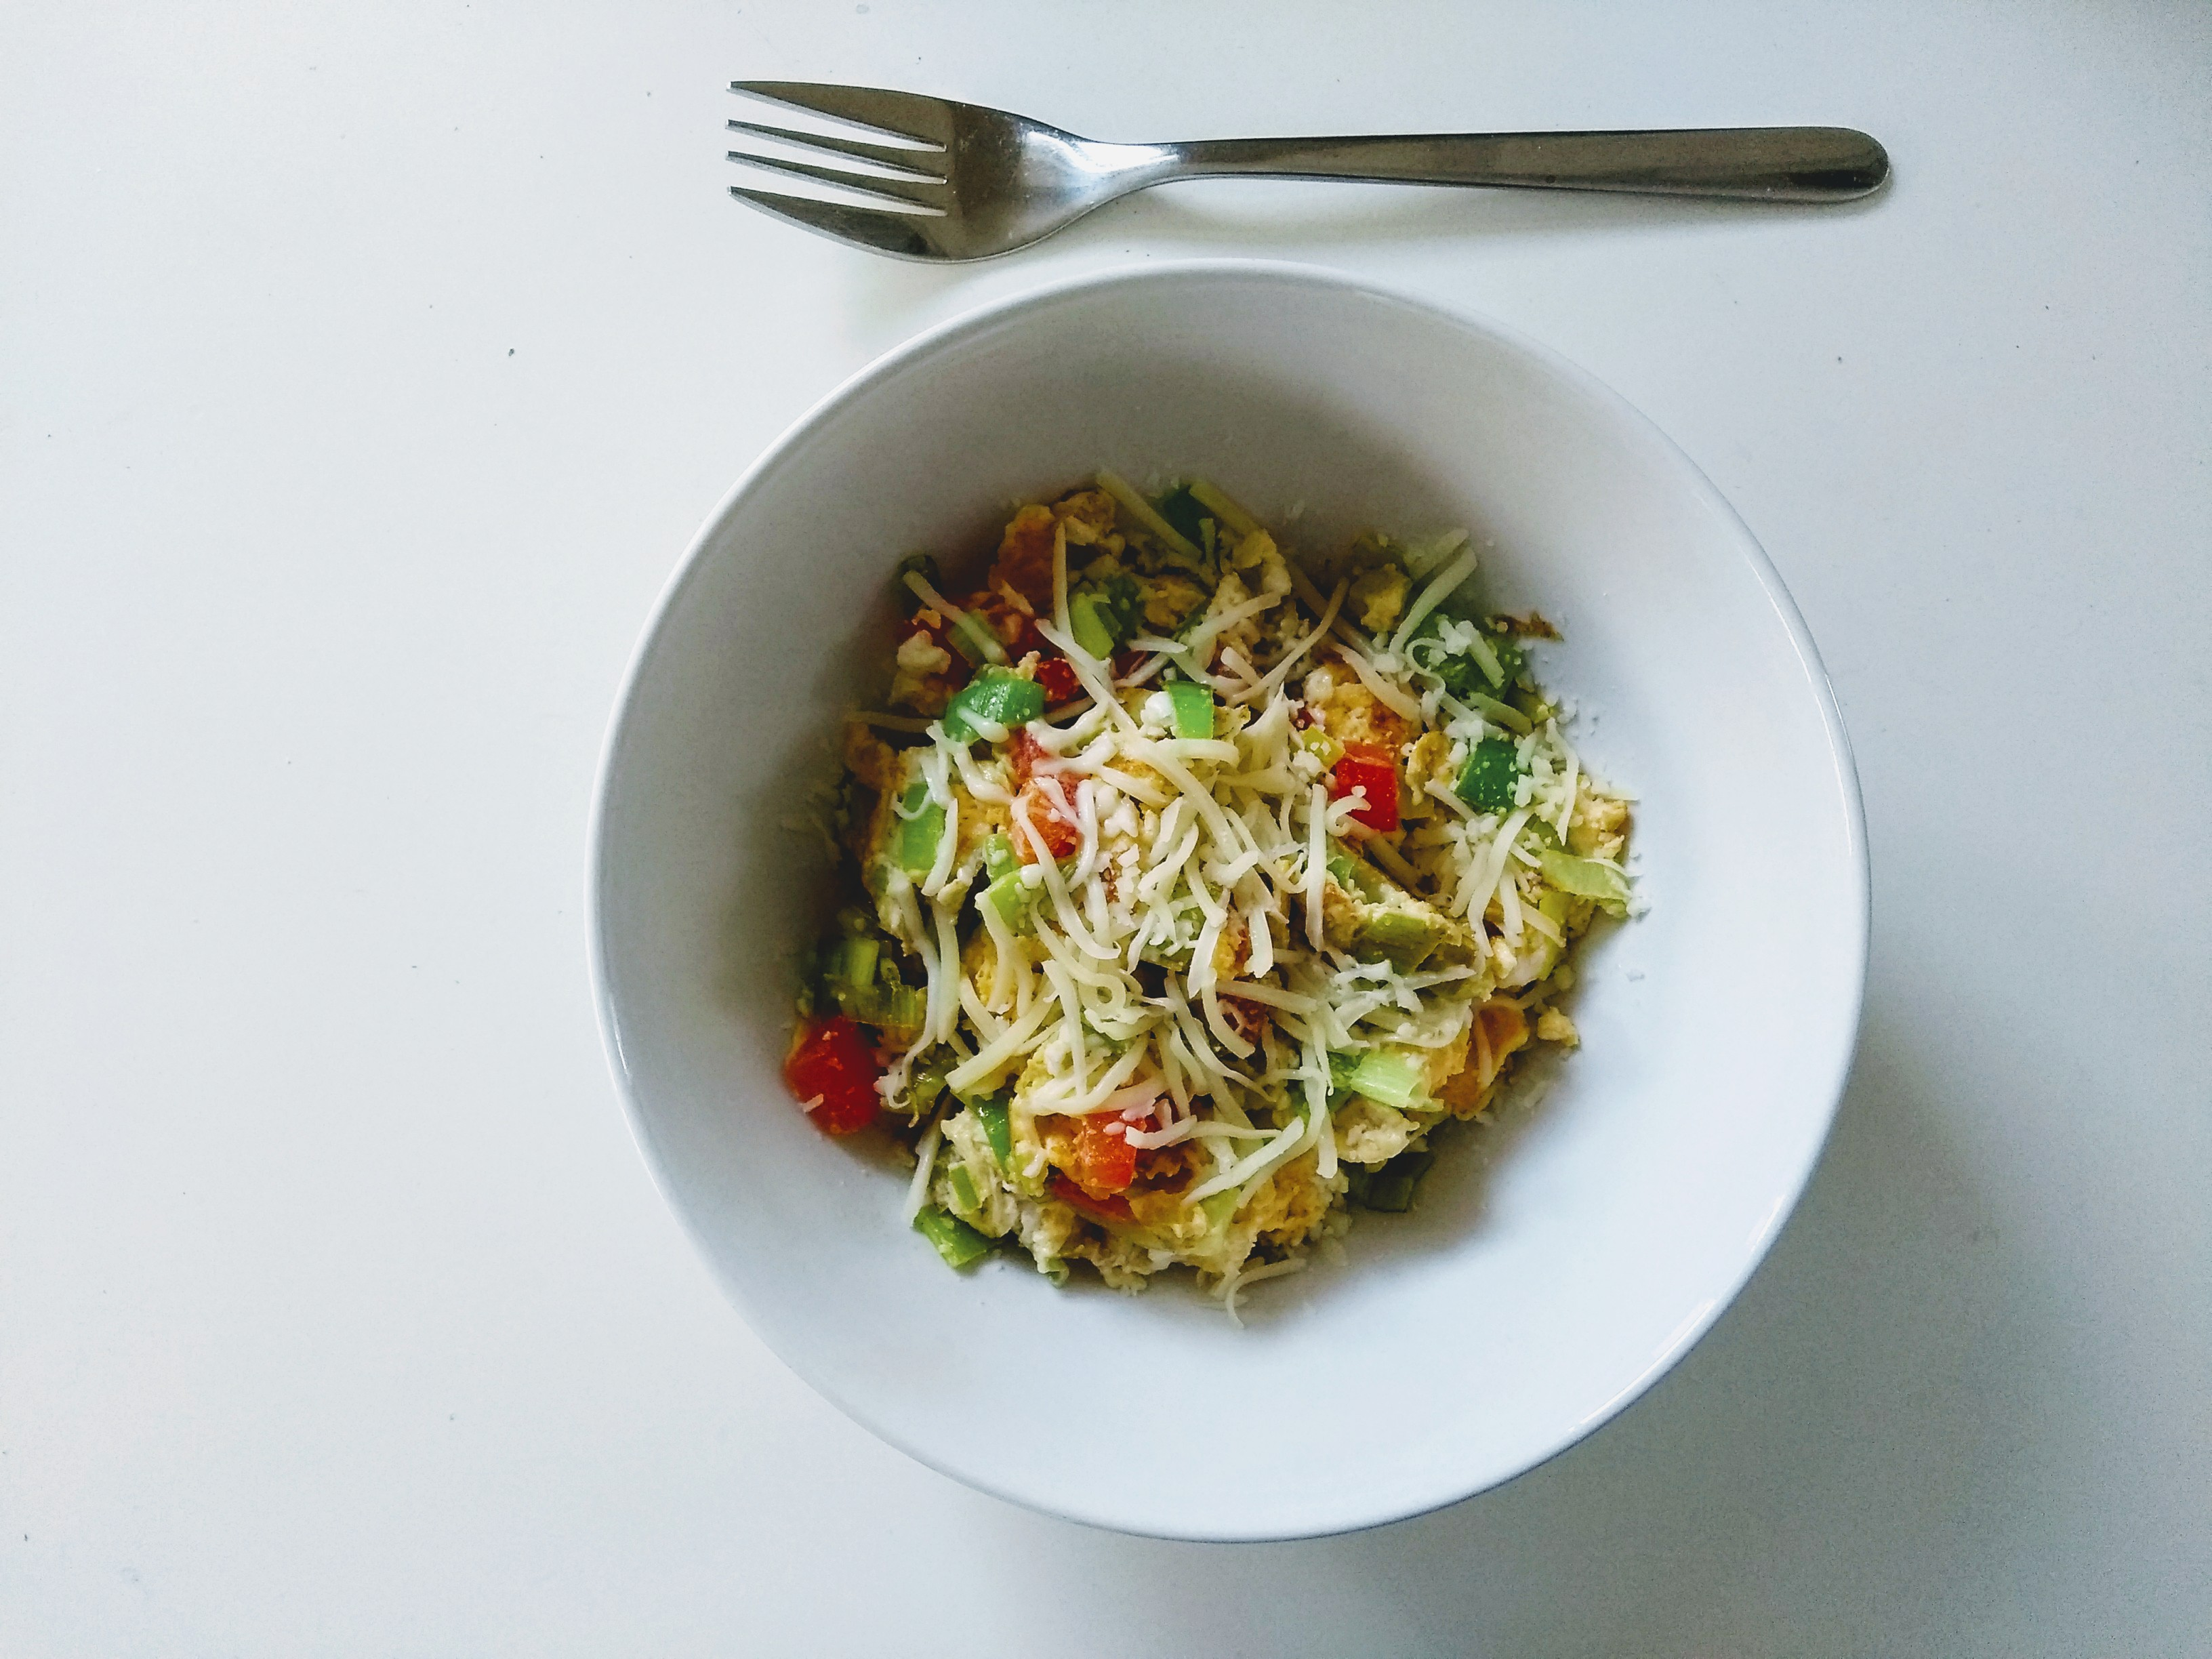 glutenvrij, glutenvrij eten, glutenvrije recepten makkelijk, favo glutenvrije eten, glutenvrij food, gluten, healthy, lifestyle, mamablog, lalog, lalog.nl, lalogblog